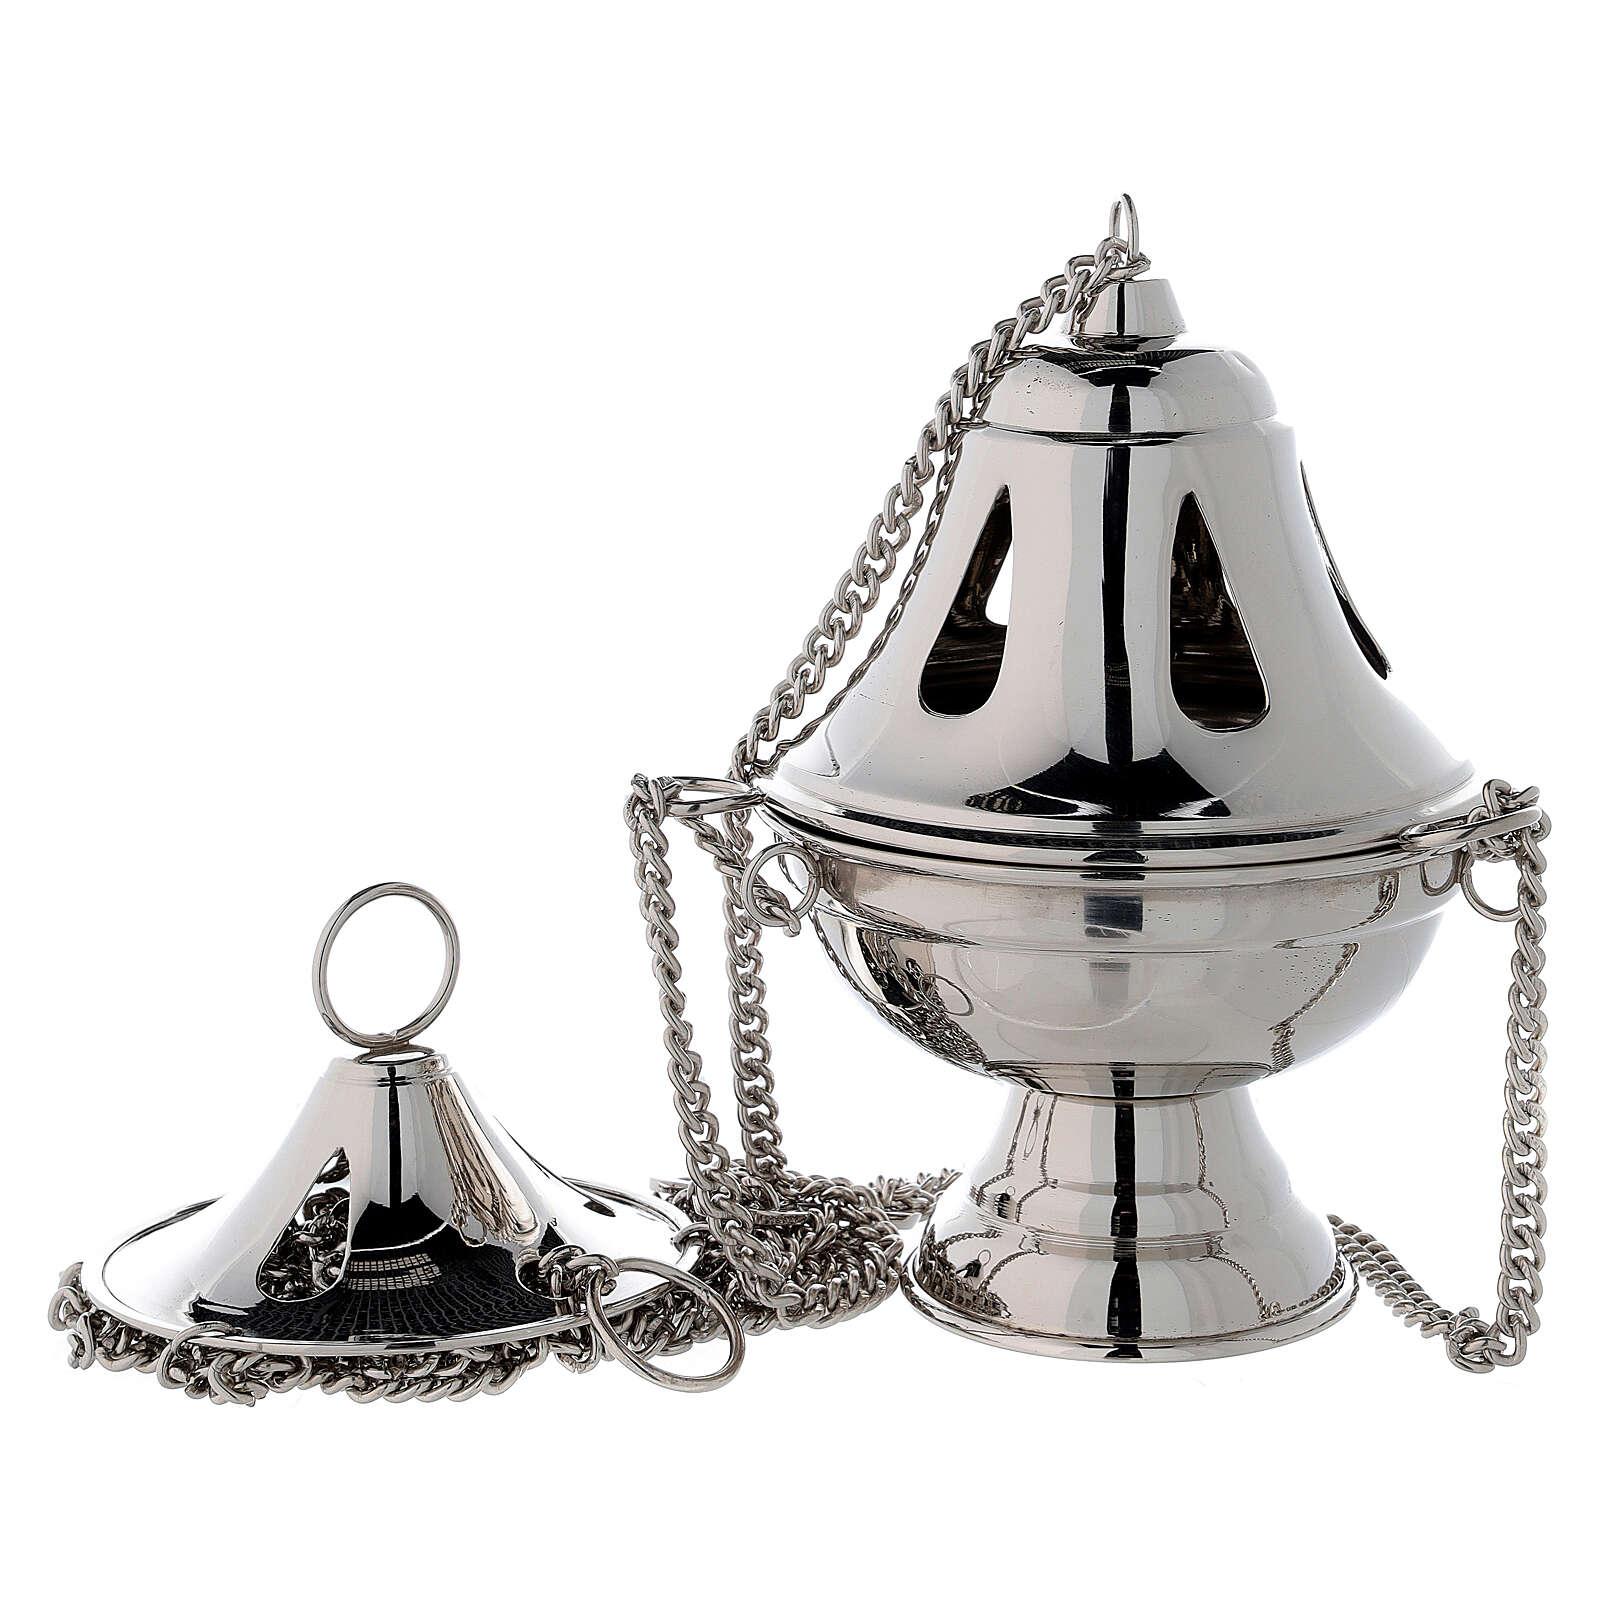 Incensario campana agujeros en forma de gota h 17 cm latón niquelado 3